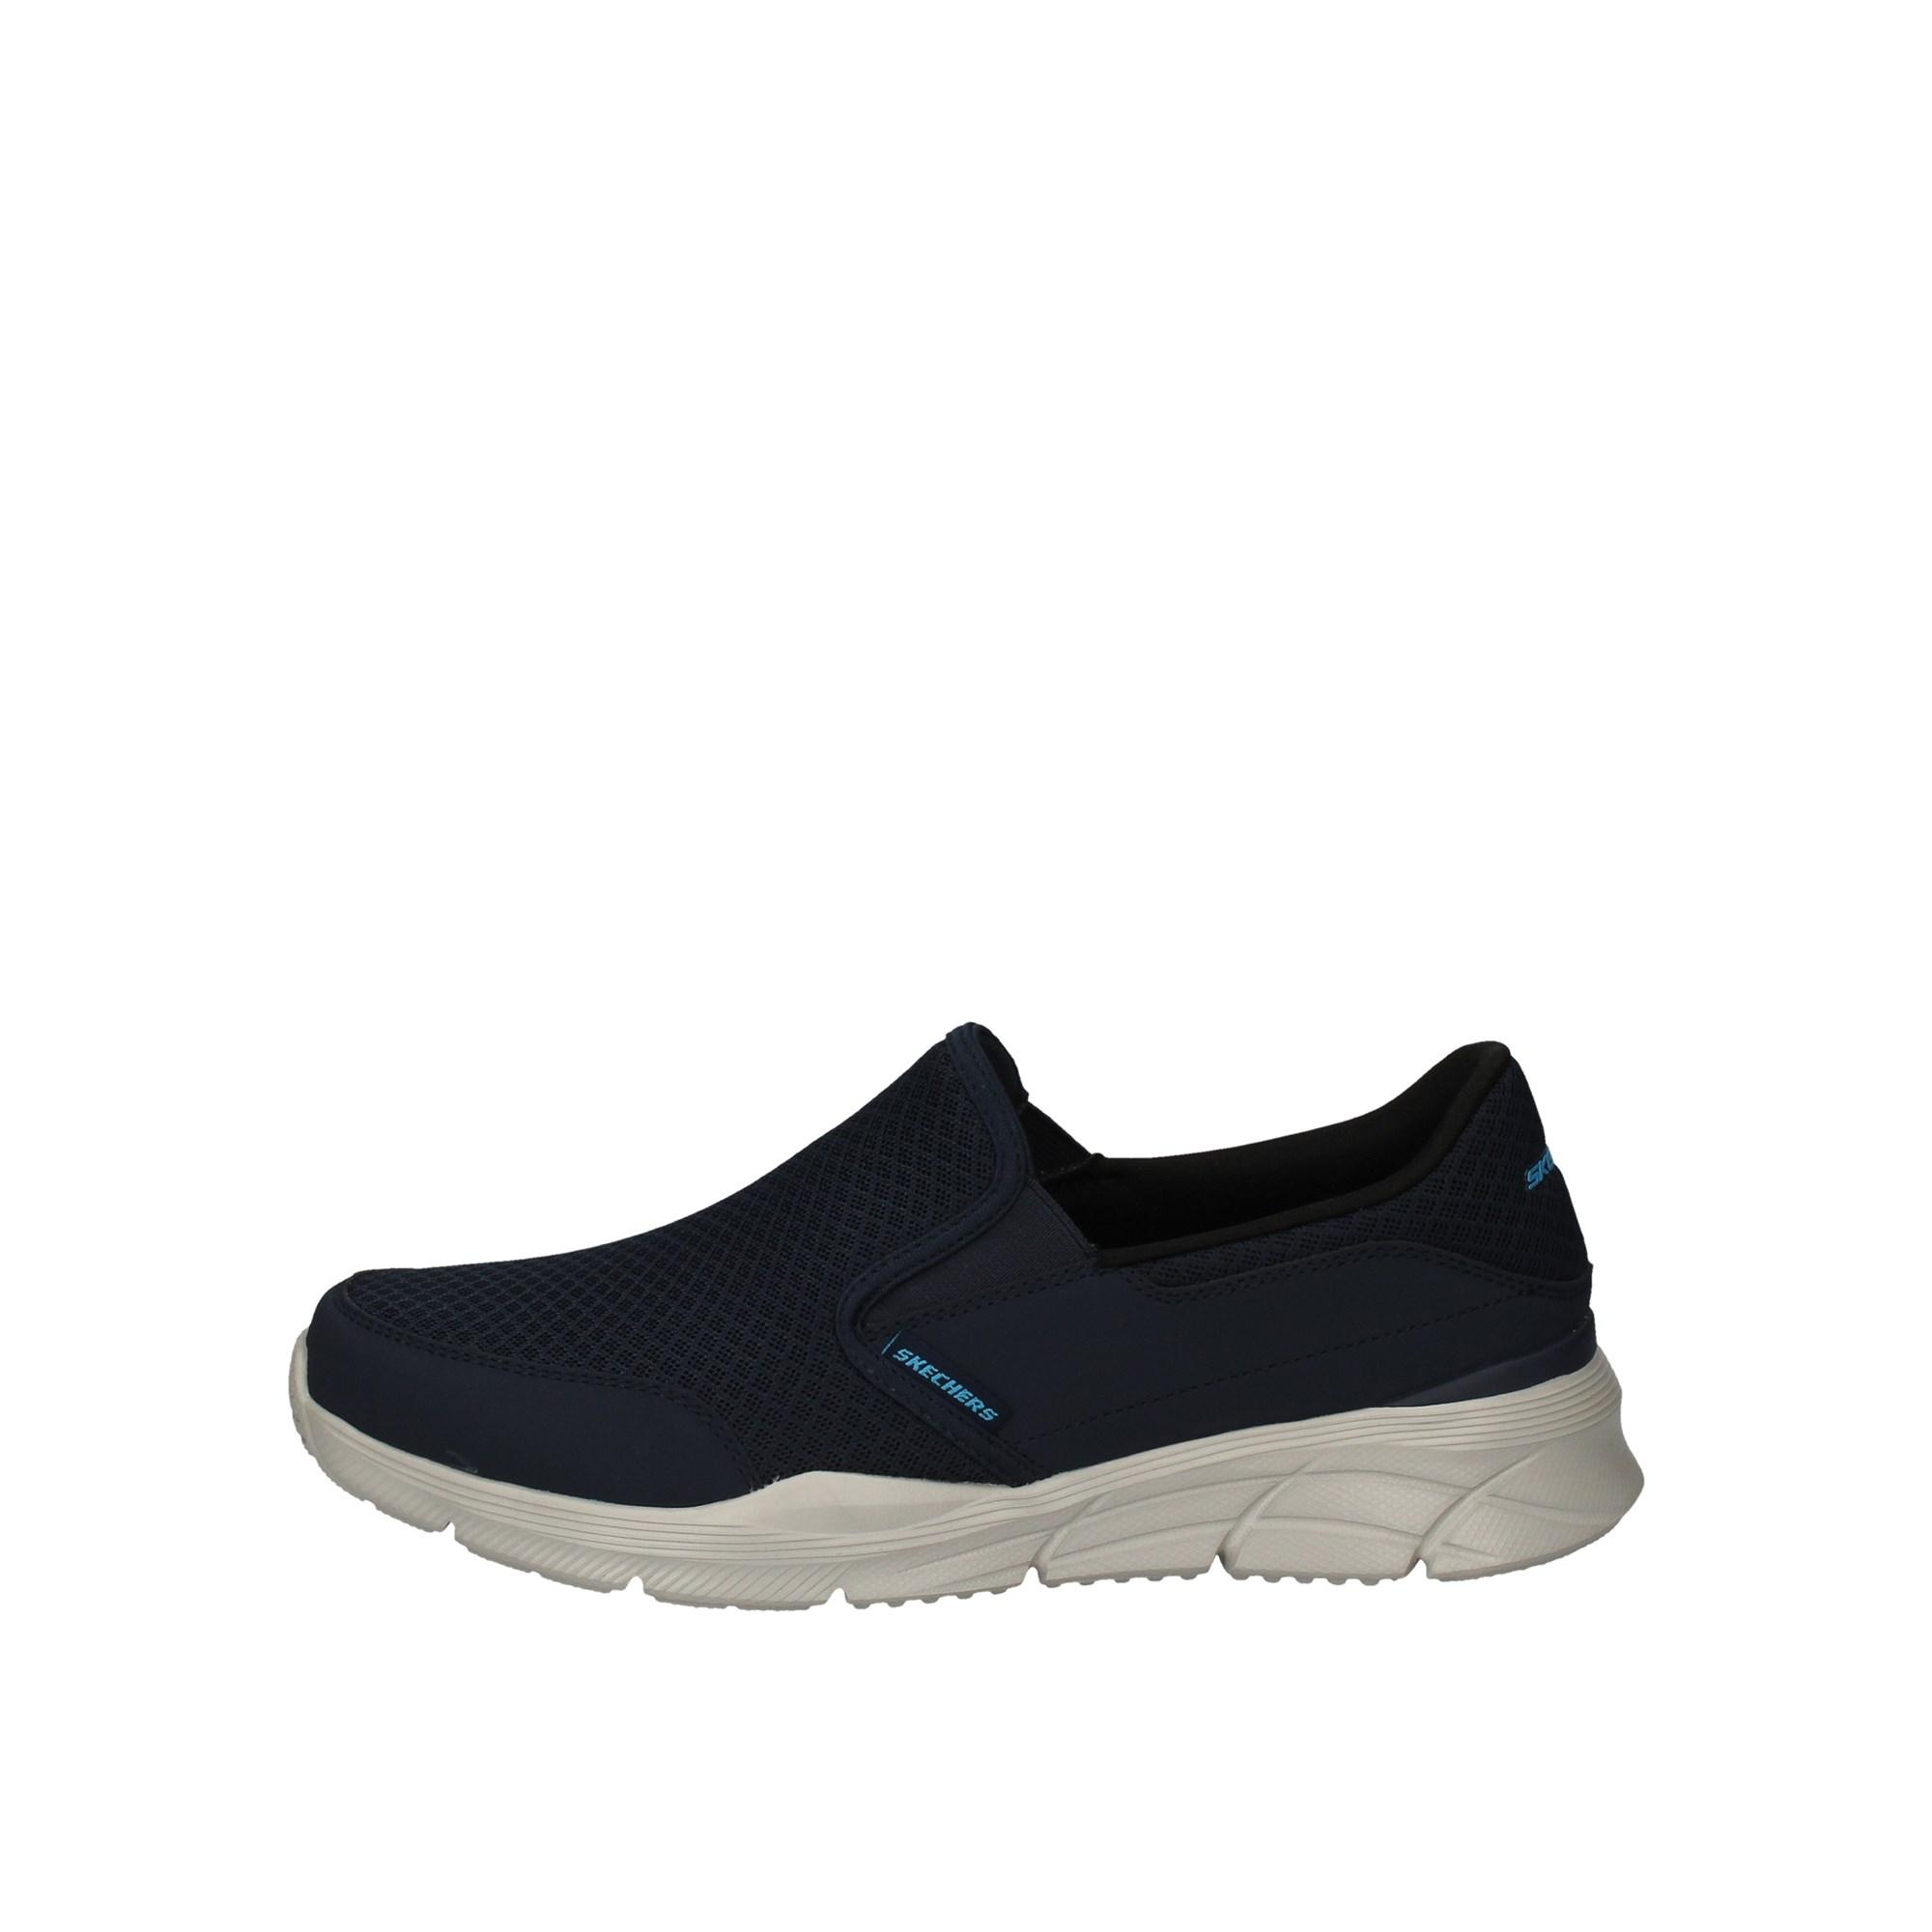 Skechers Slip On Blu | Slip On Uomo 100% Tessuto | Lalilina